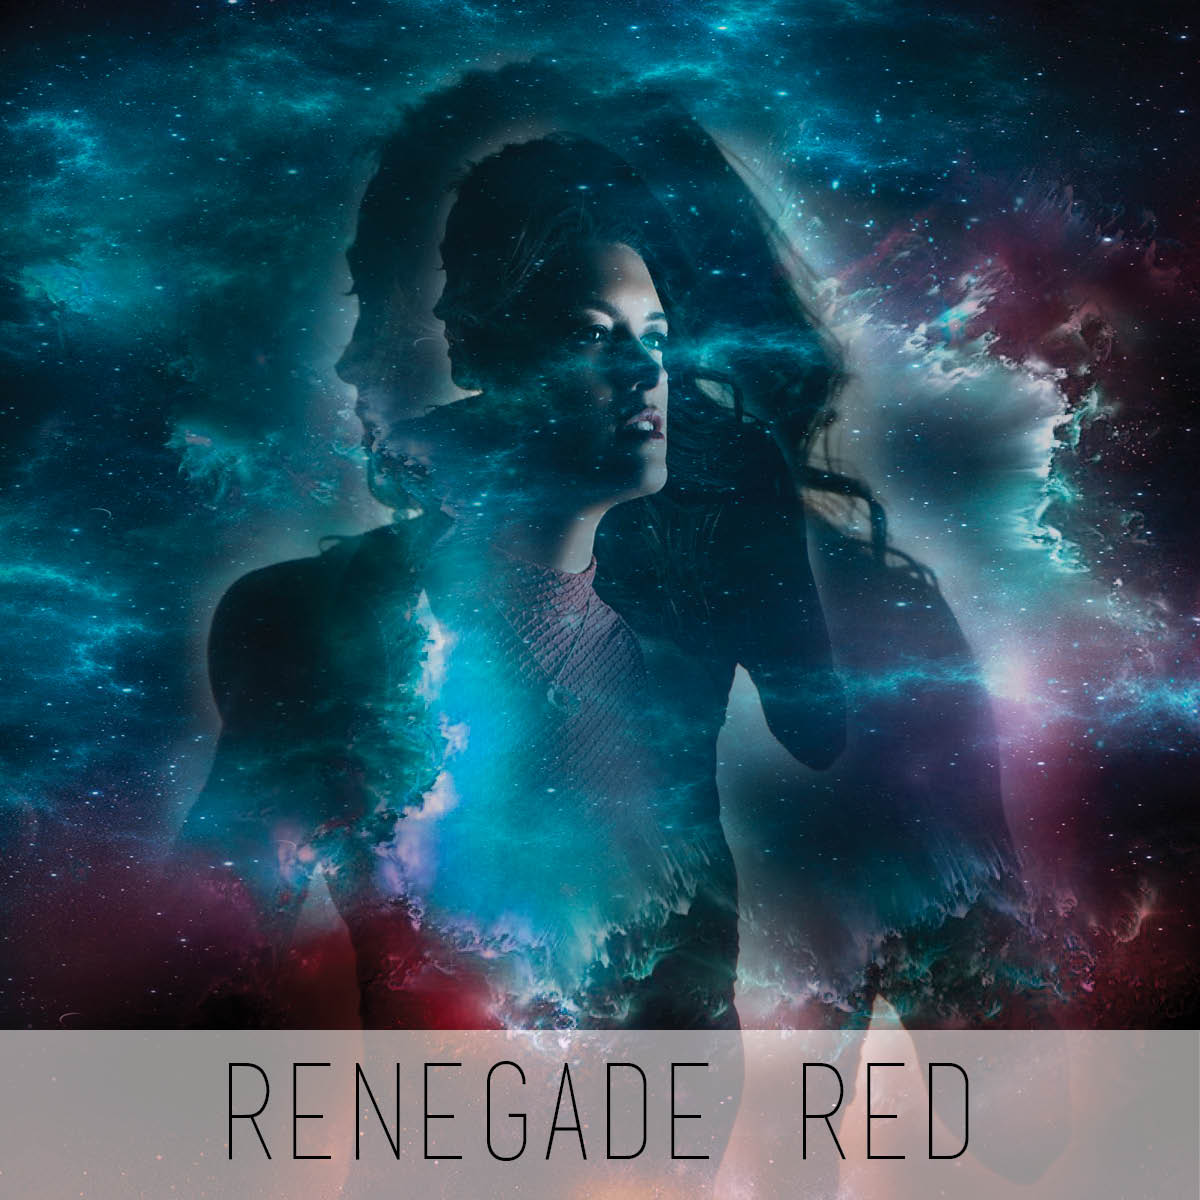 renegade red title card.jpg